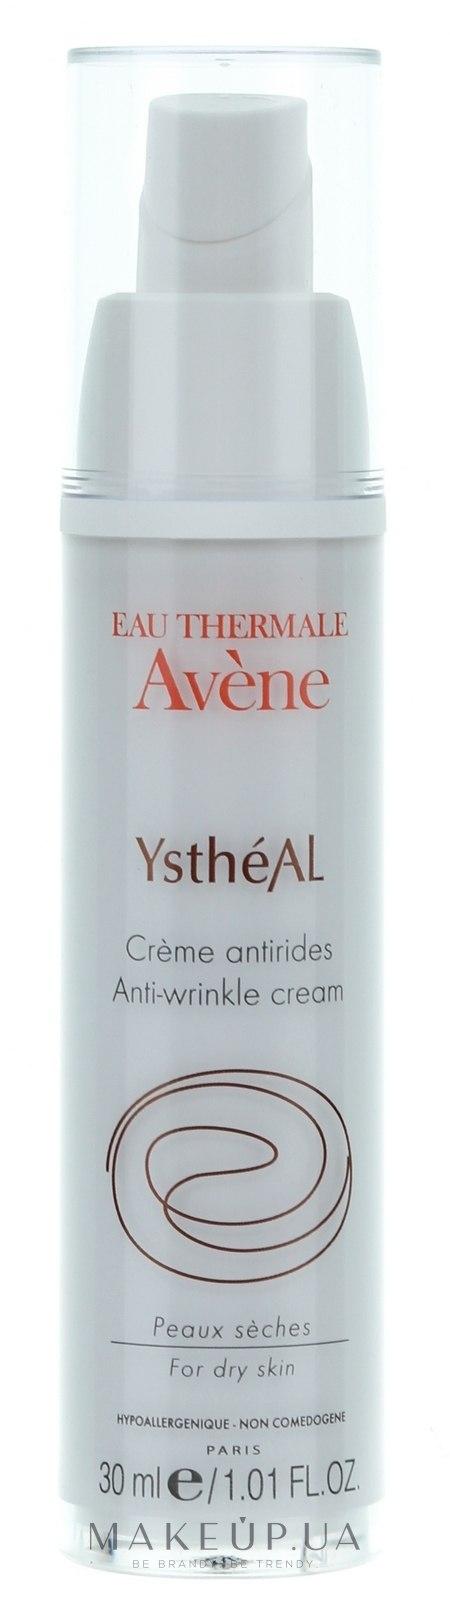 Антивозрастной крем - Avene Anti-Age Ystheal+ Cream ... - MAKEUP